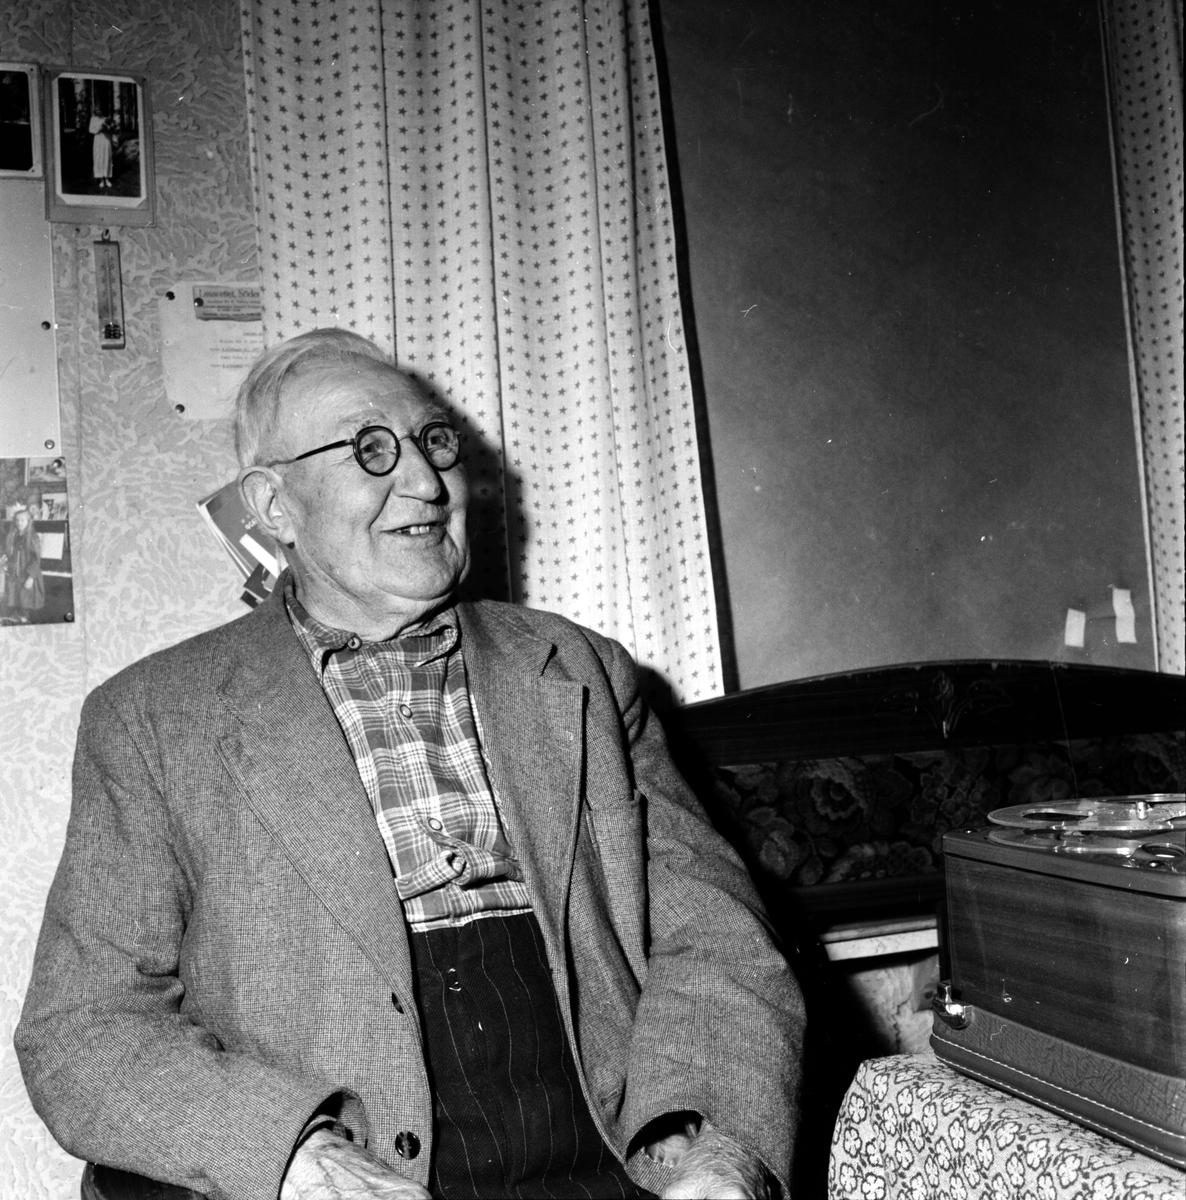 Bergvik, Inspeln. av gamla, Bergström,Åström,Jonsson,Georg Spaak,Andersson, 9 Nov 1957